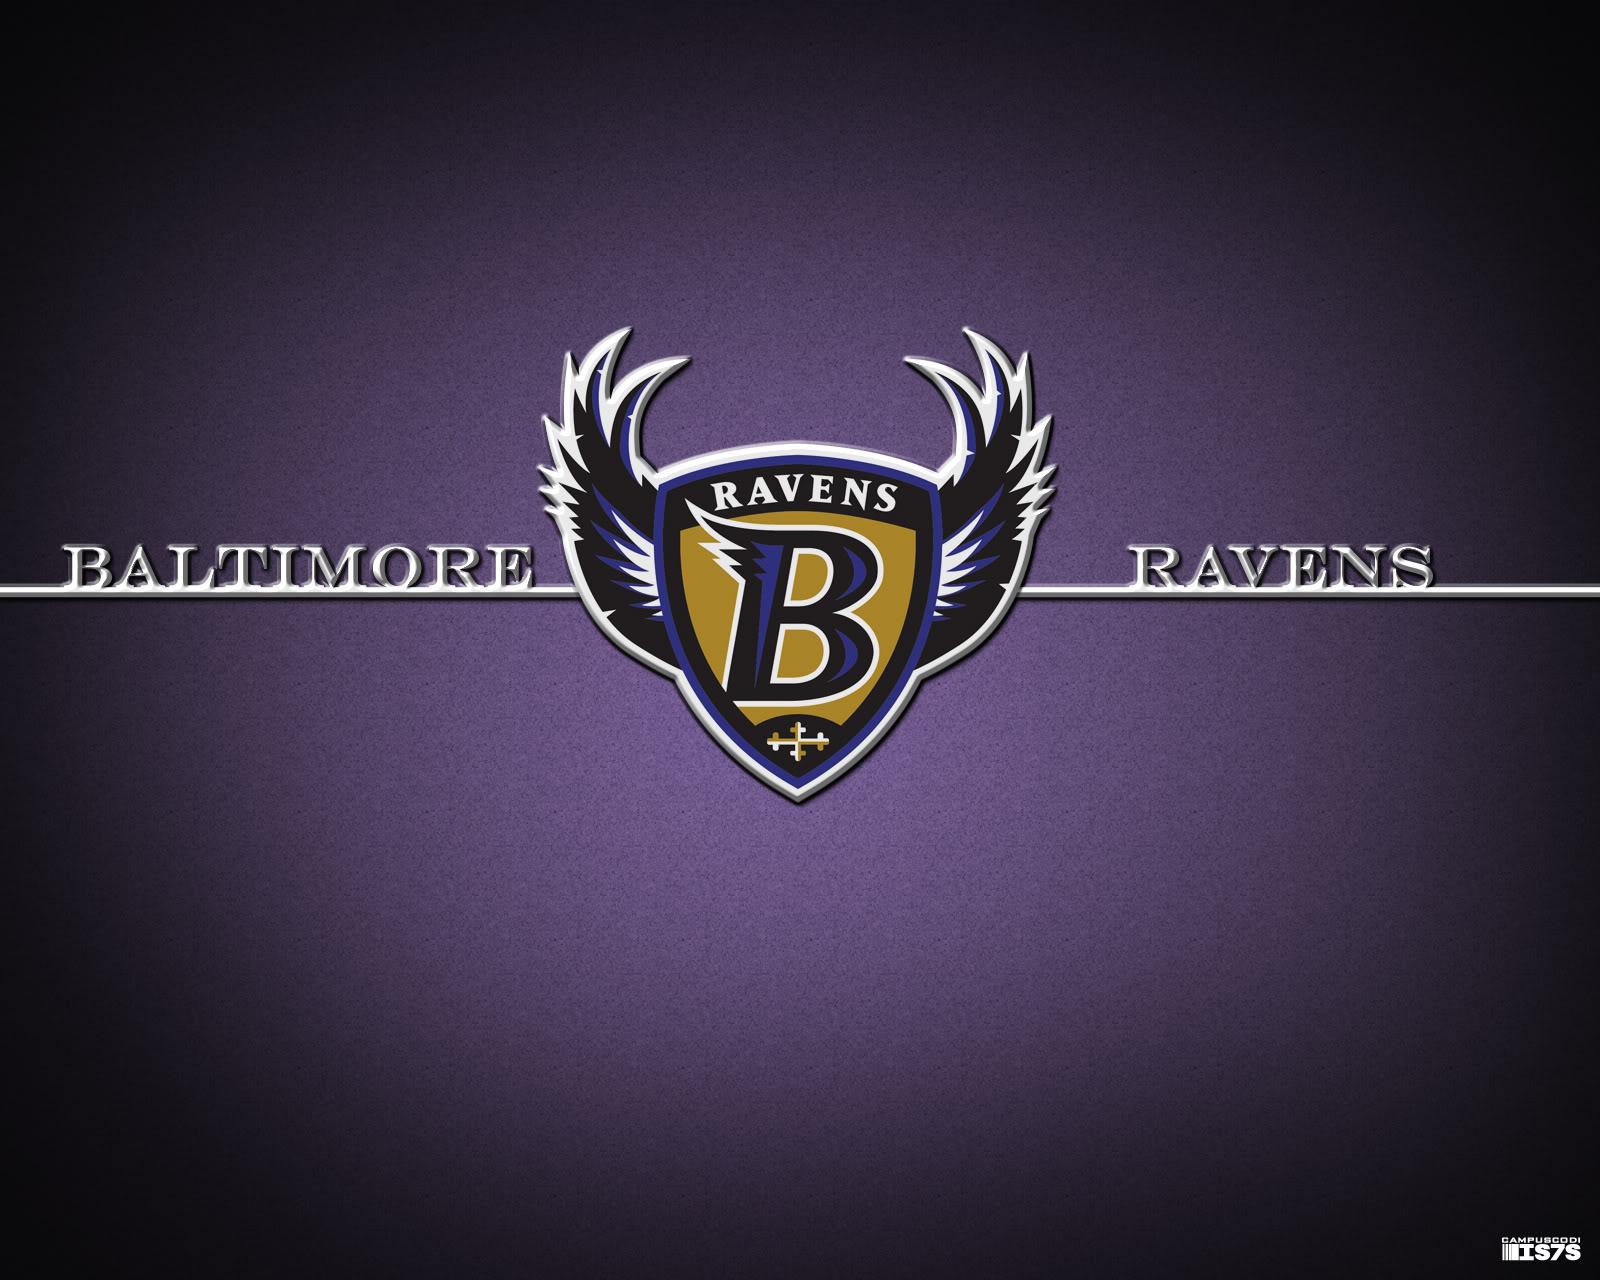 Ravens wallpaper wallpaper ever Baltimore Ravens wallpapers 1600x1280